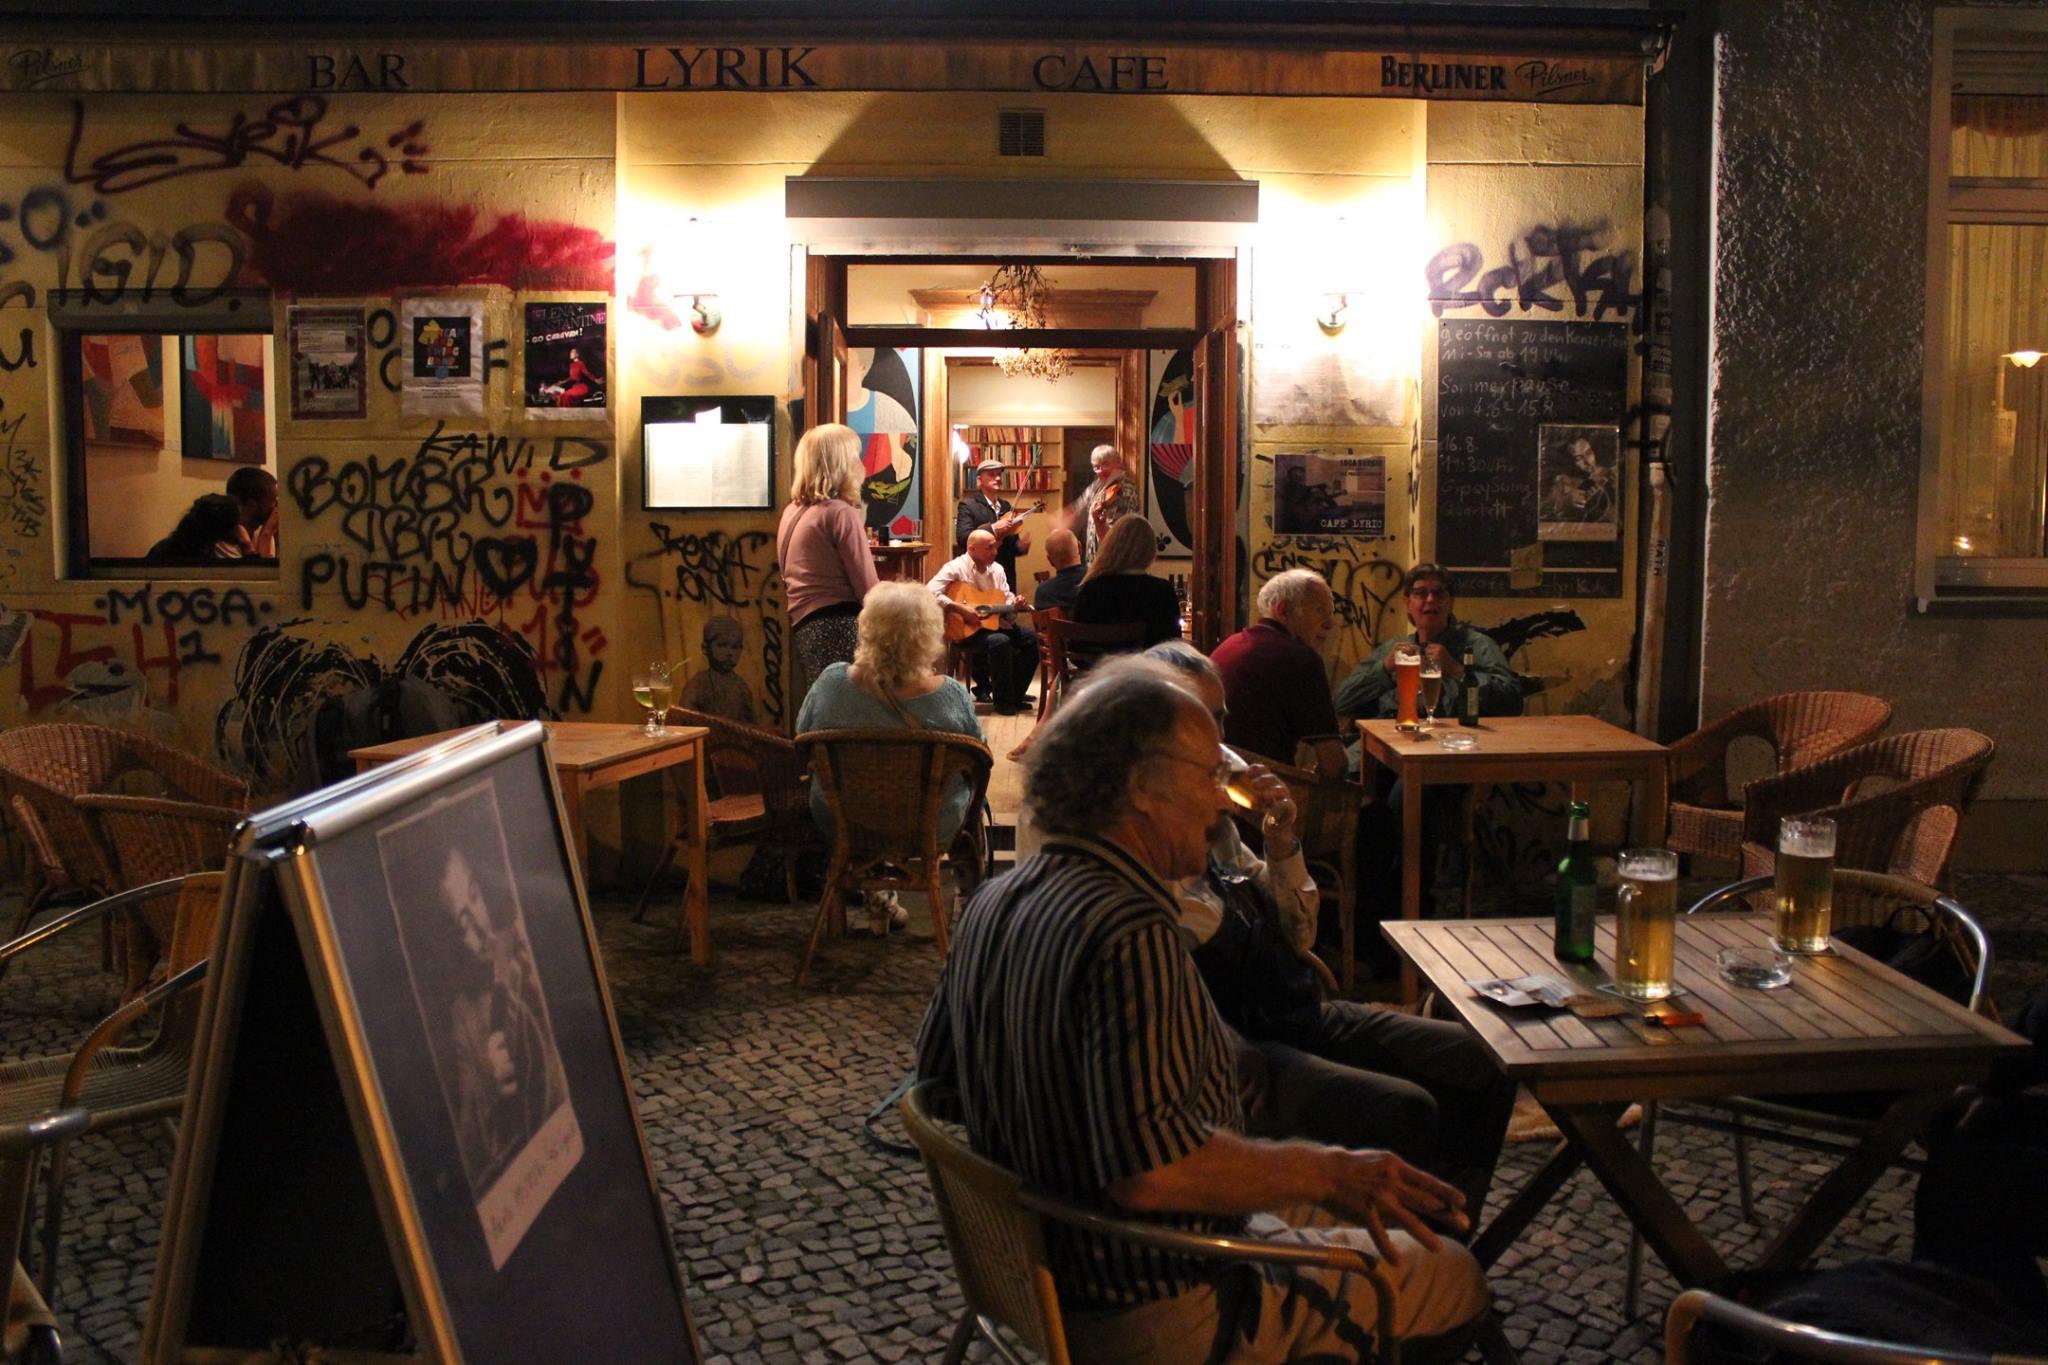 Cafe Lyrik